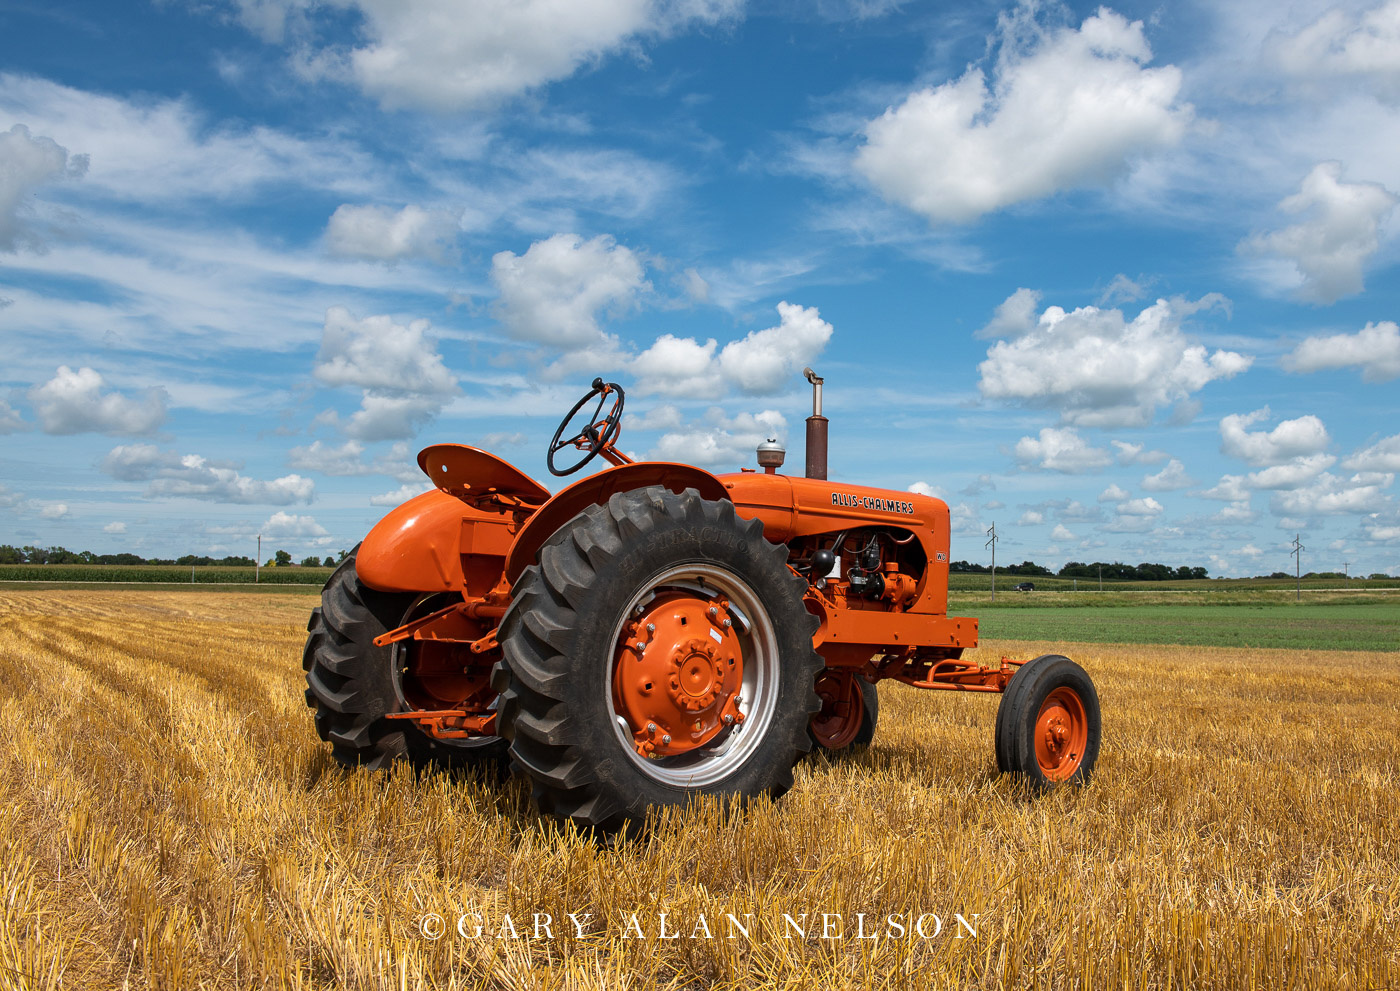 Allis-Chalmers, antique tractor, photo